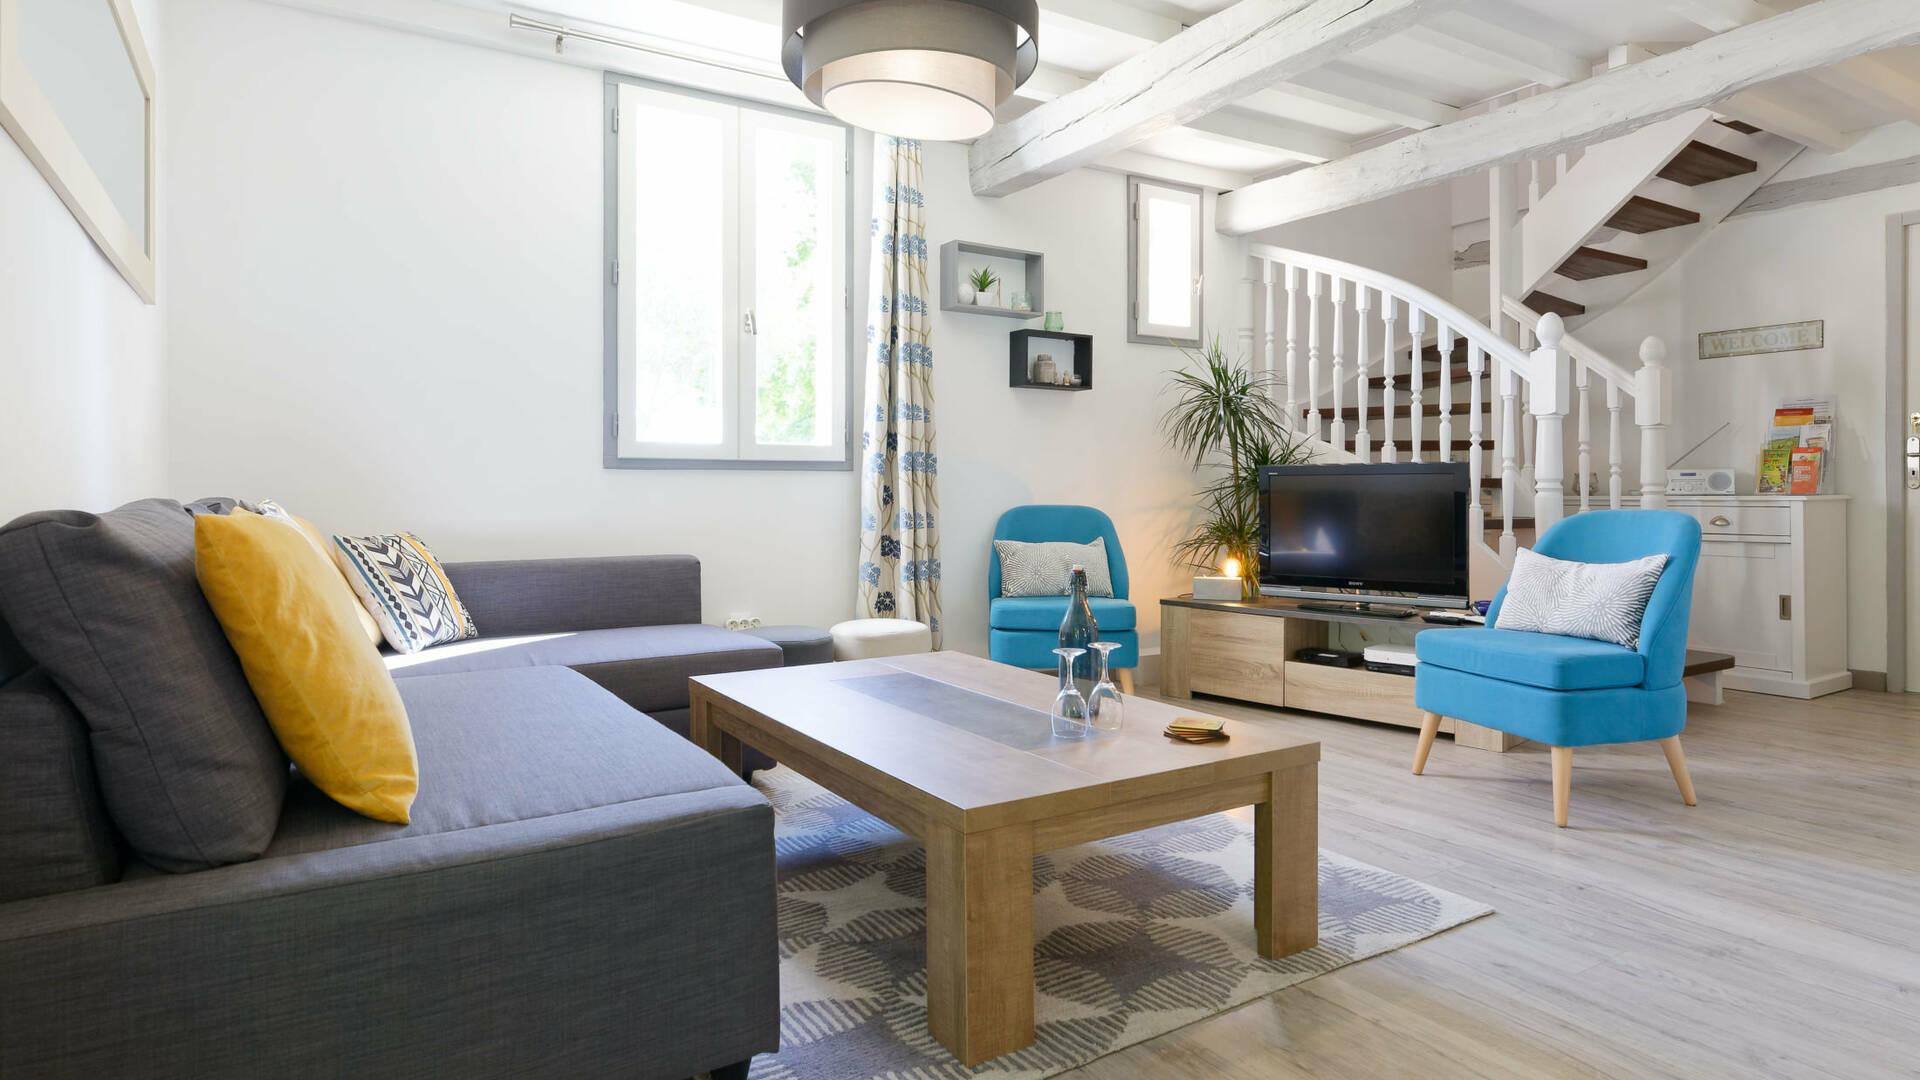 Living Room, Gite La Maison Bleue, Savignac-Mona, Lombez, Samatan, Savès, Gascogne, Gers, France